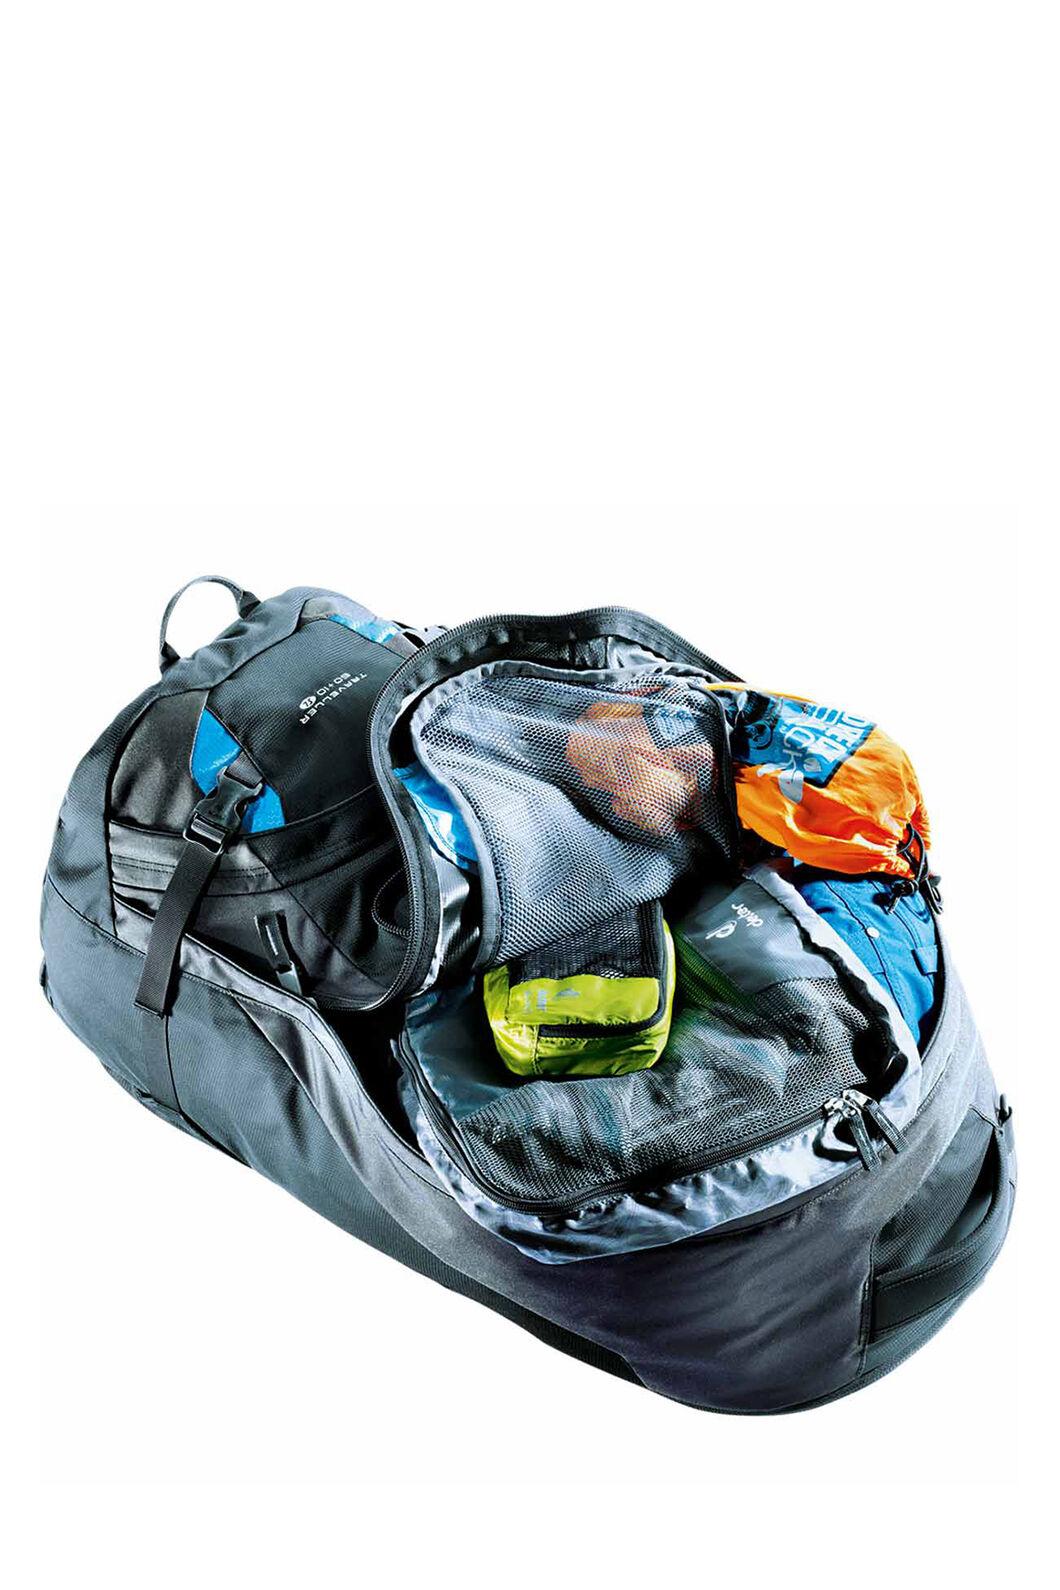 Deuter Traveller SL Travel Pack 60L+10L, None, hi-res